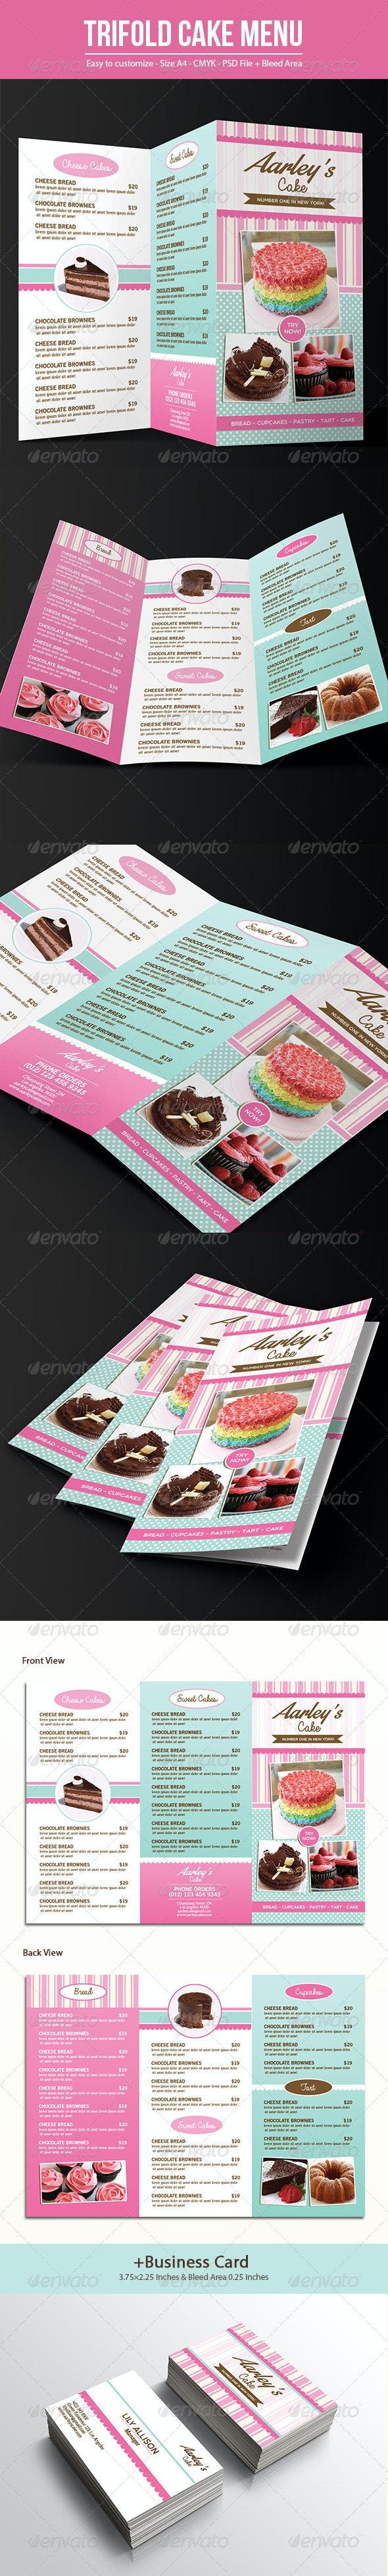 Trifold Cake Menu + Business Card - Food Menus Print Templates